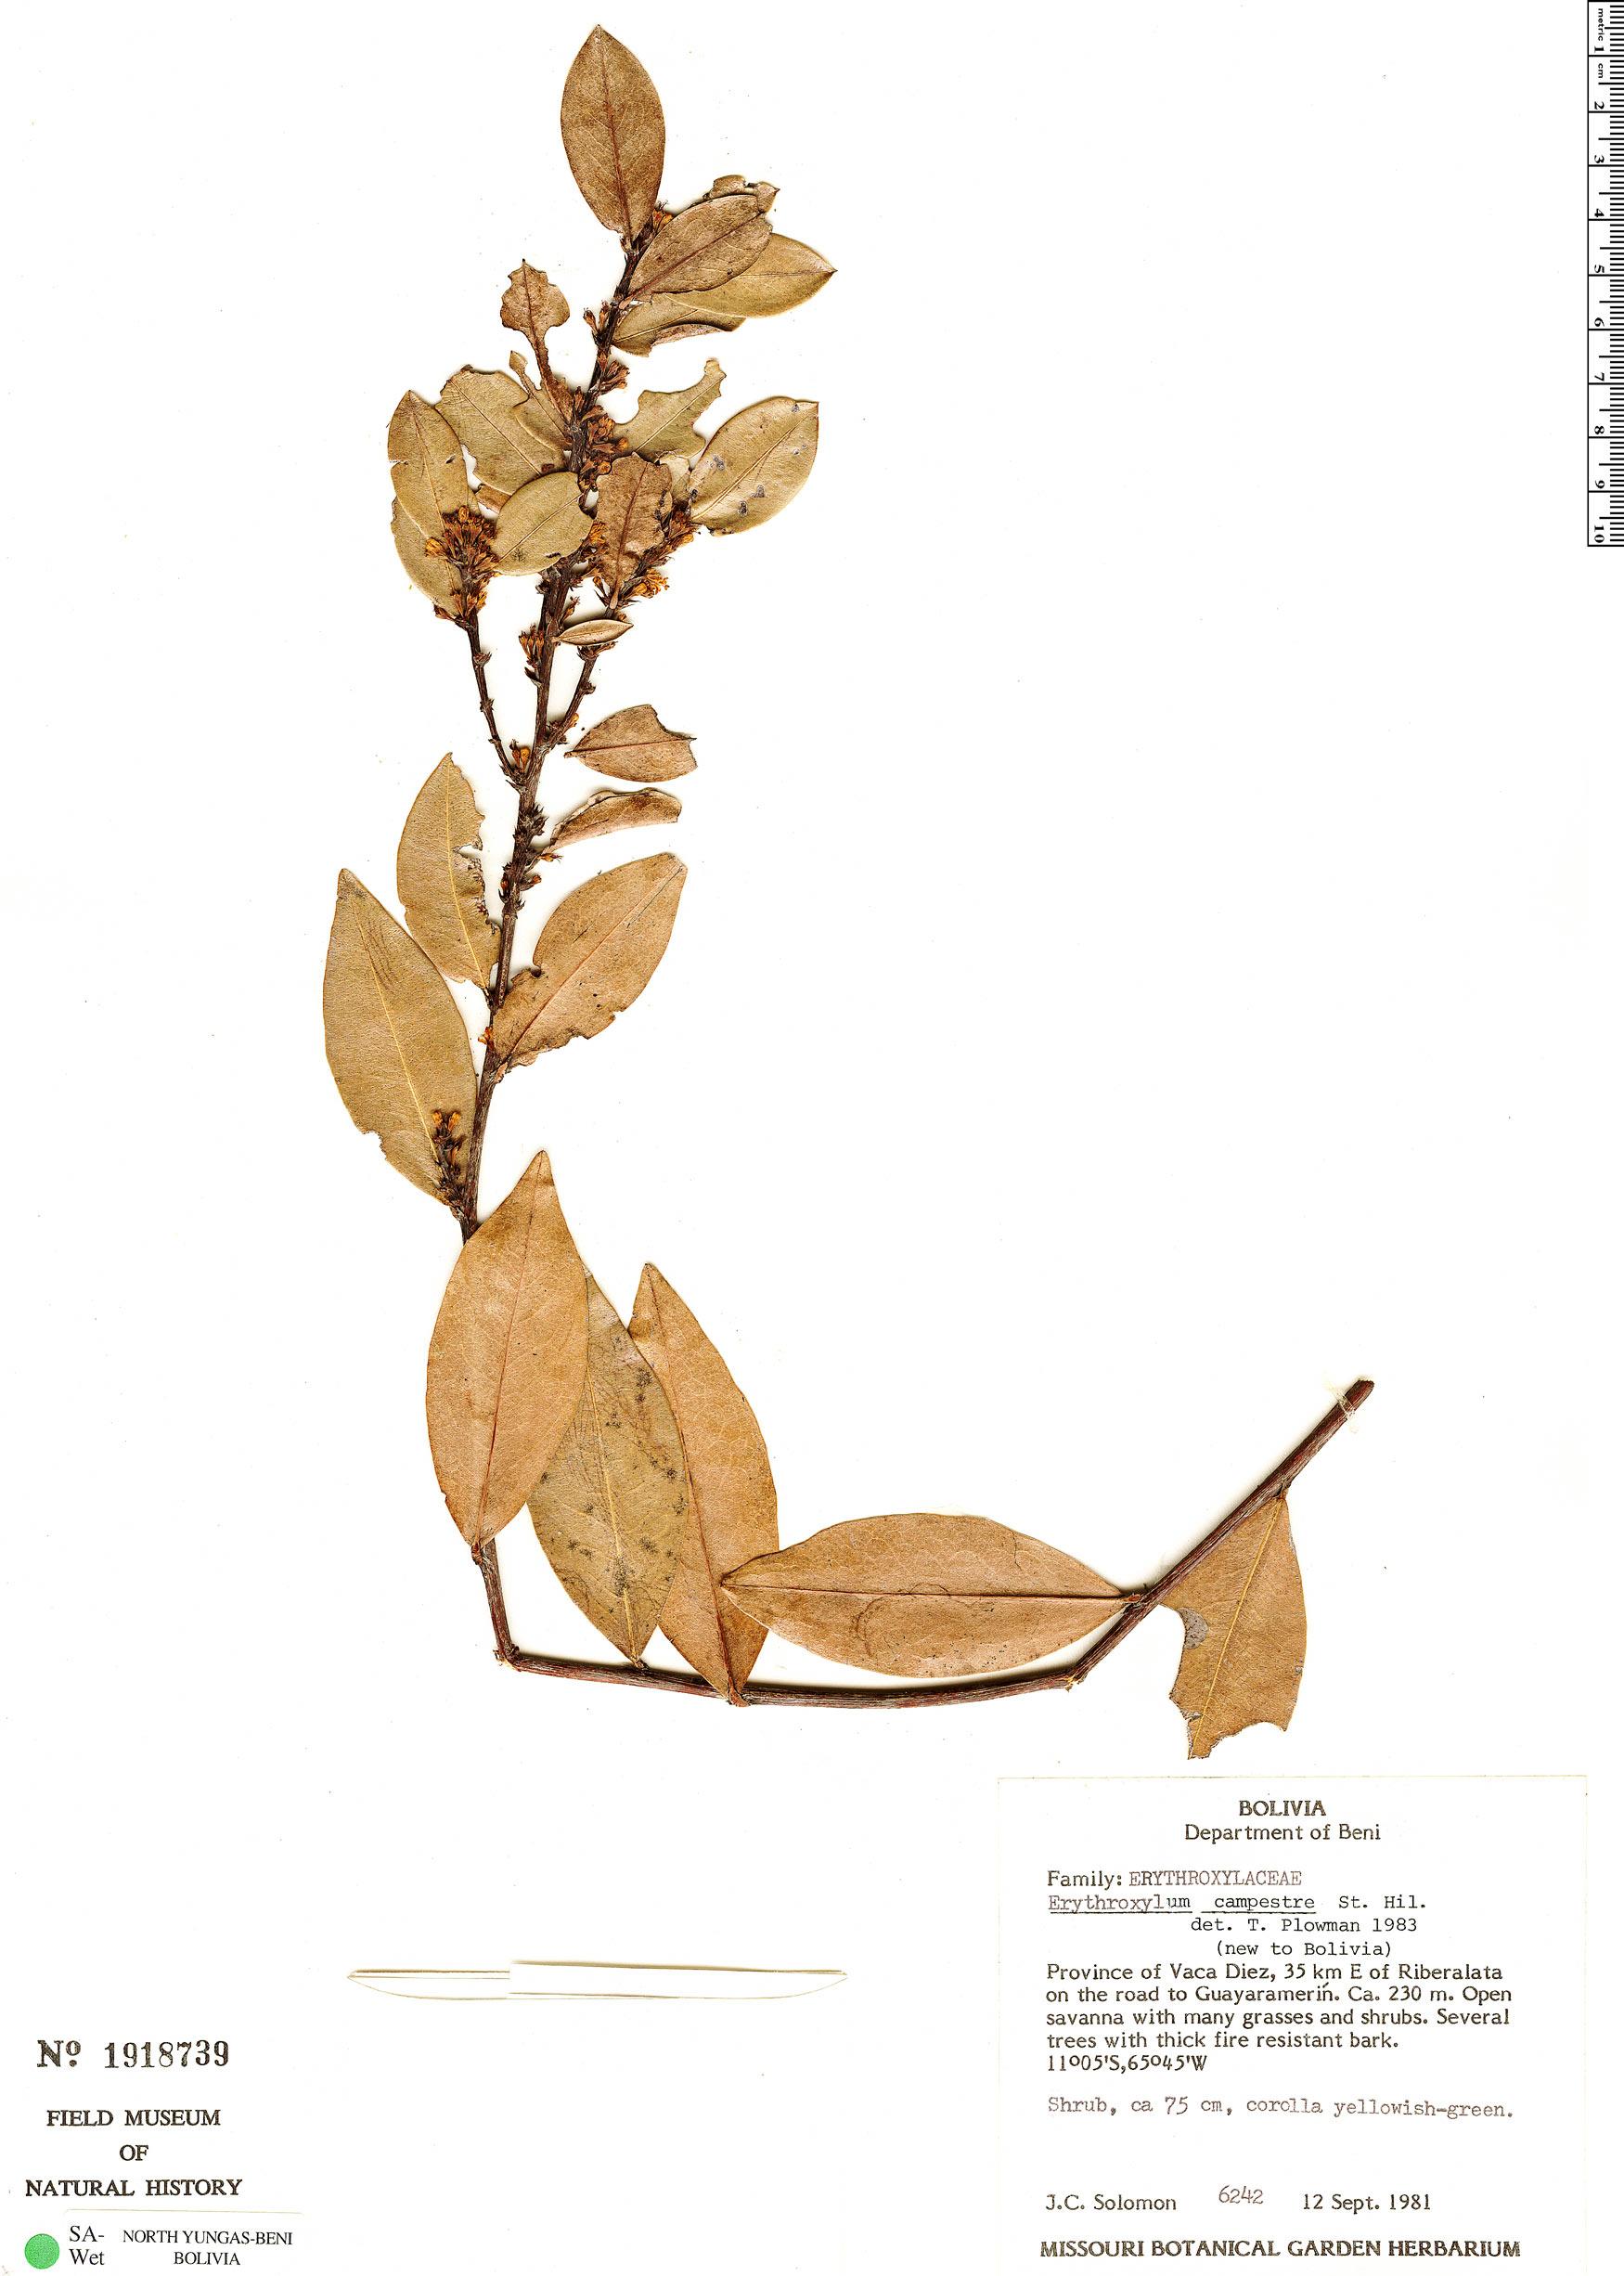 Espécimen: Erythroxylum campestre